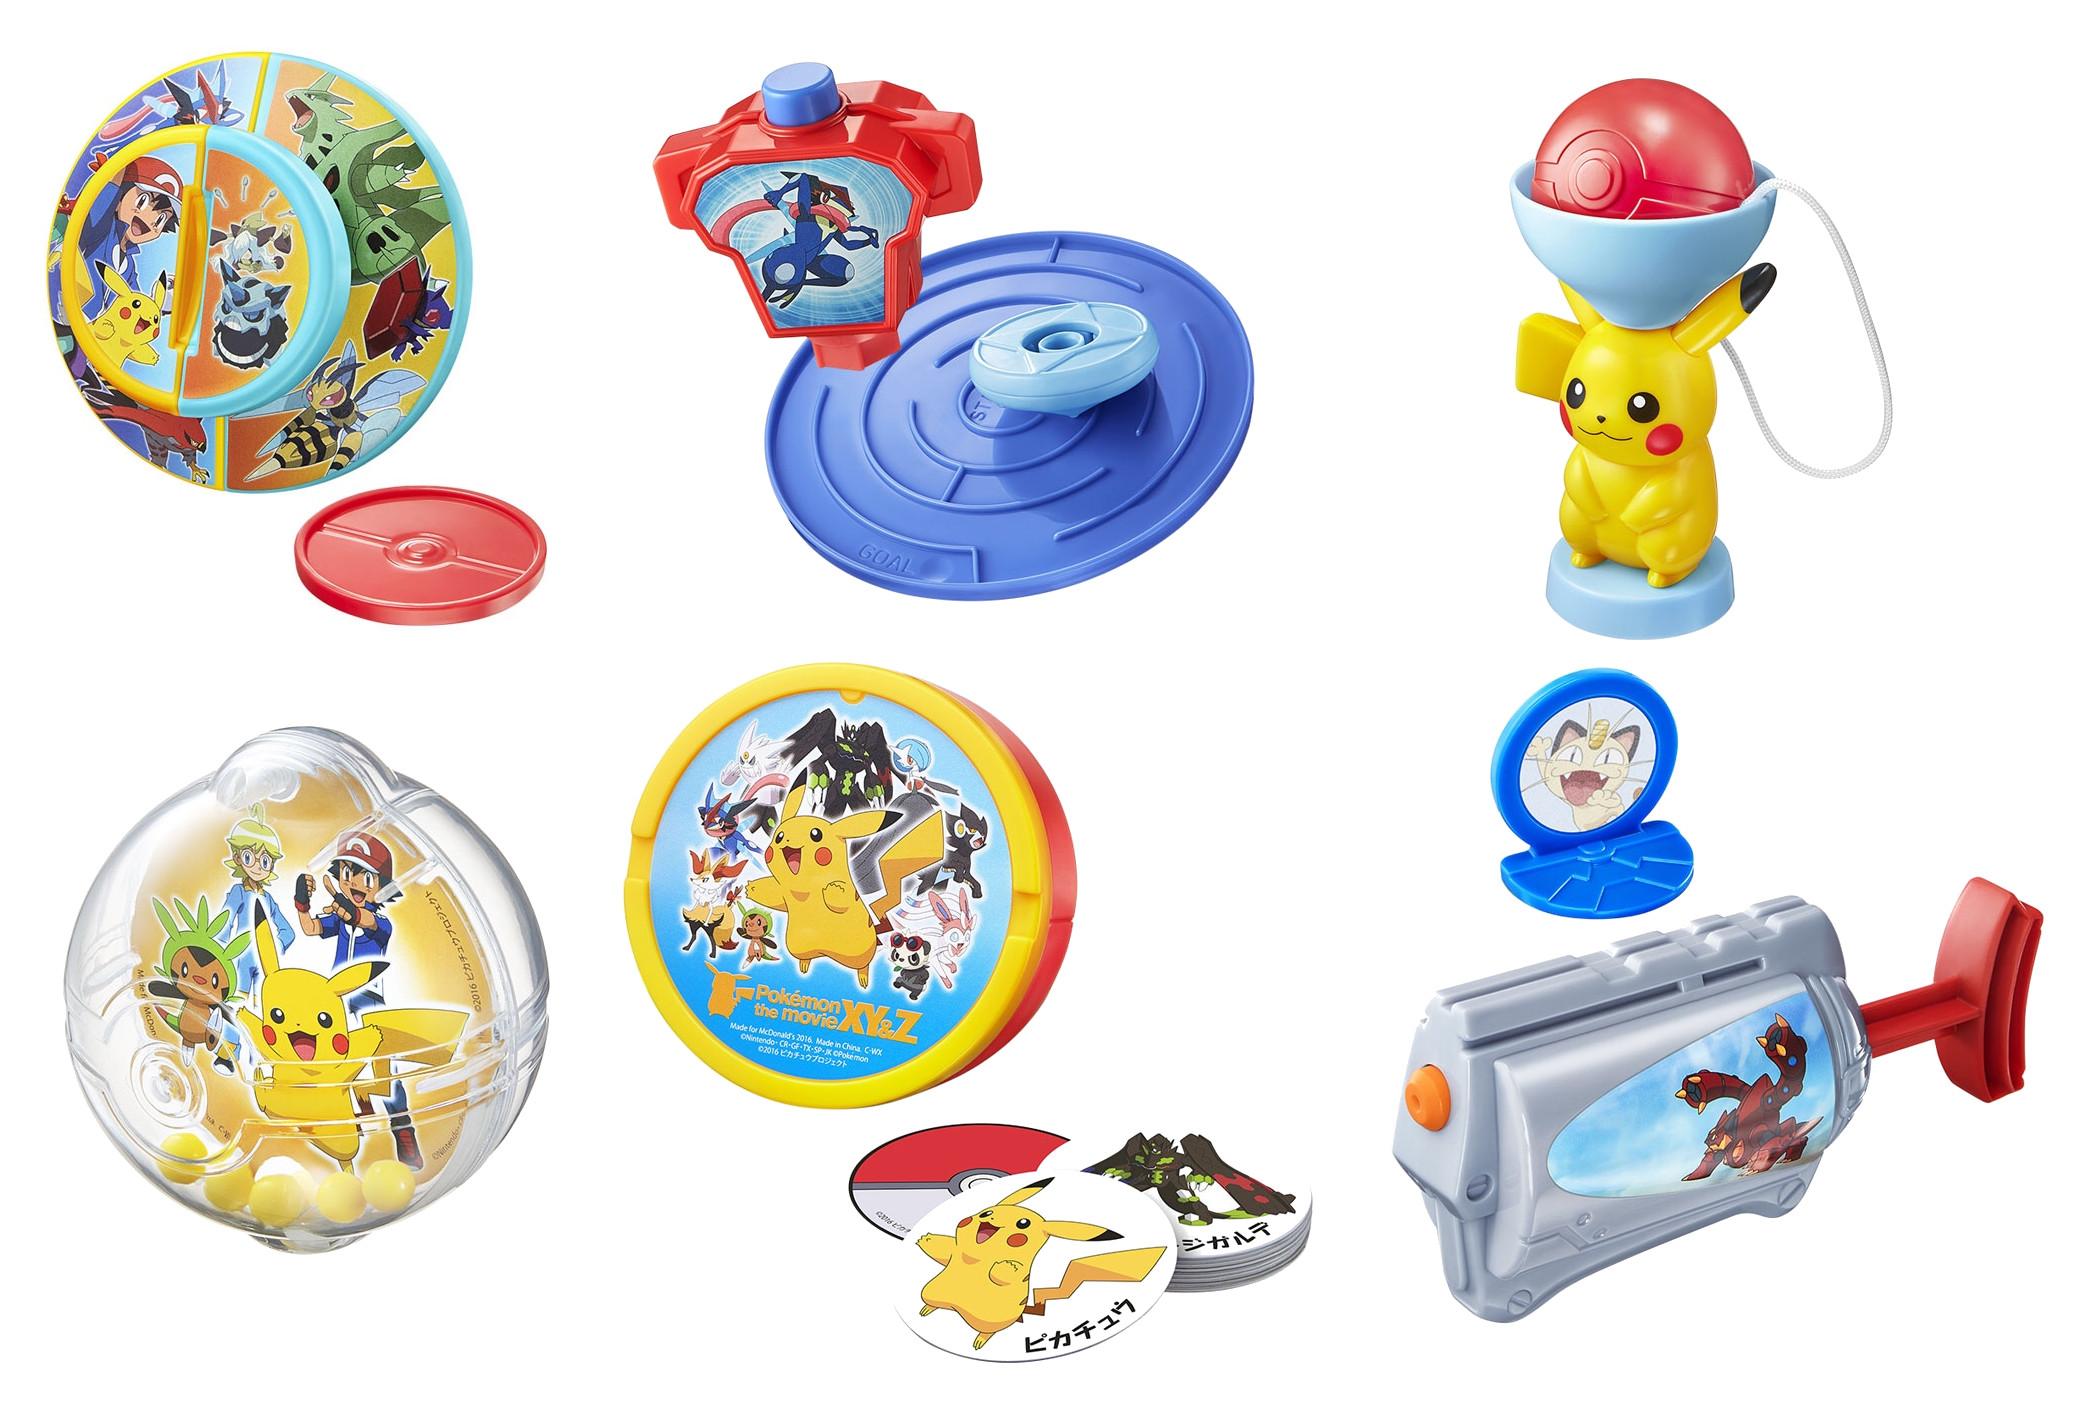 Pokémon spielzeug bald im happy meal japanischer mcdonalds